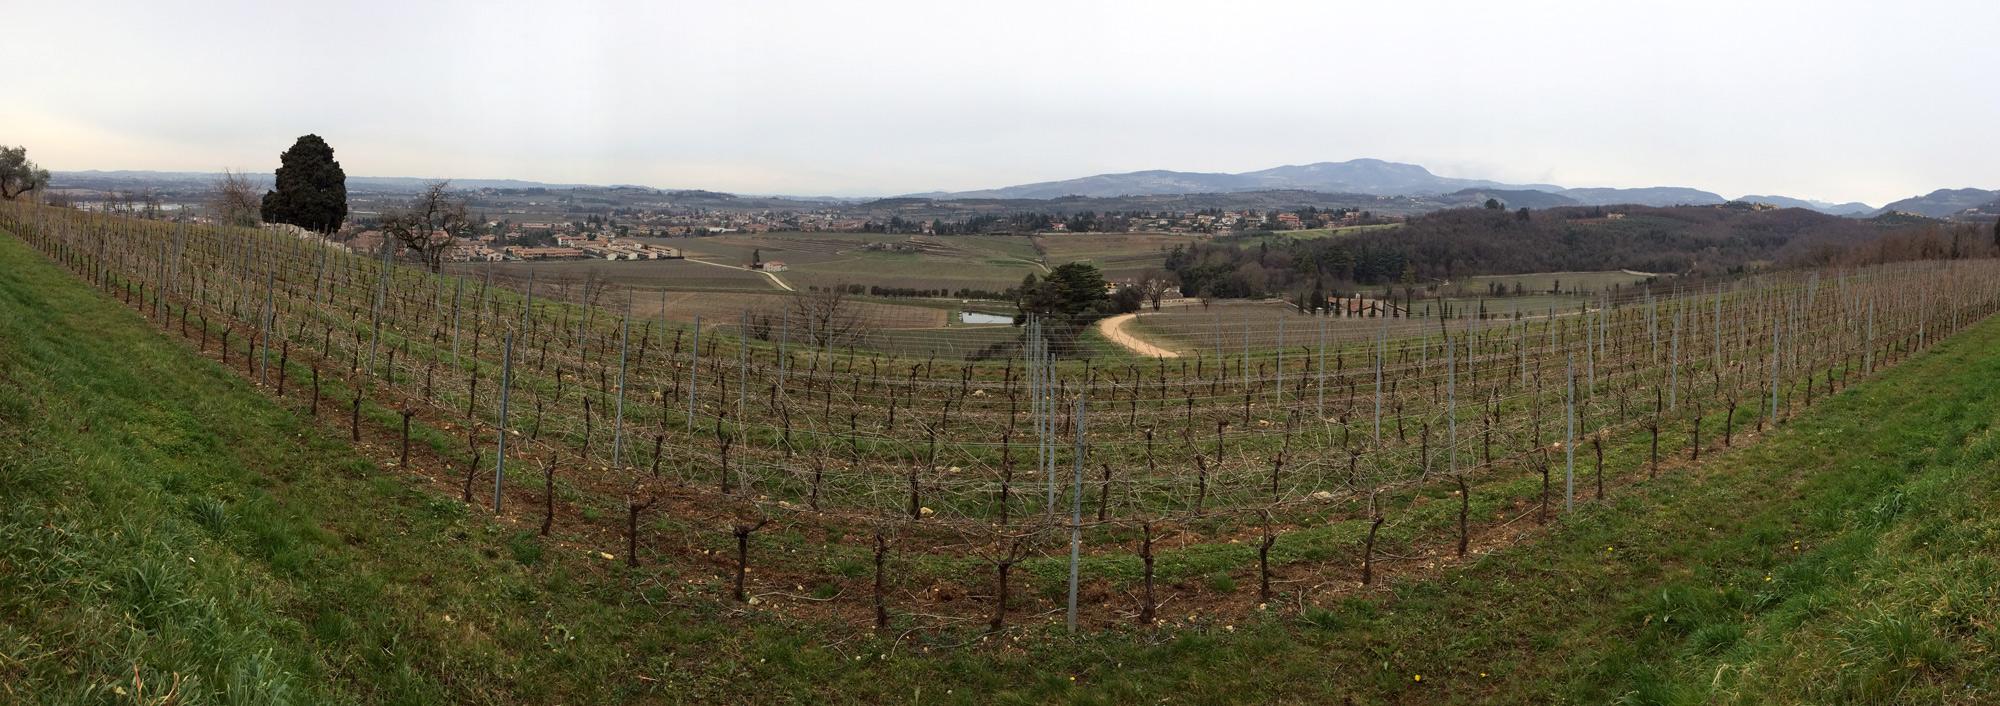 Looking west into the Negrar Valley in the Classico region of Amarone della Valpolicella - Vineyard photo by Wine Folly